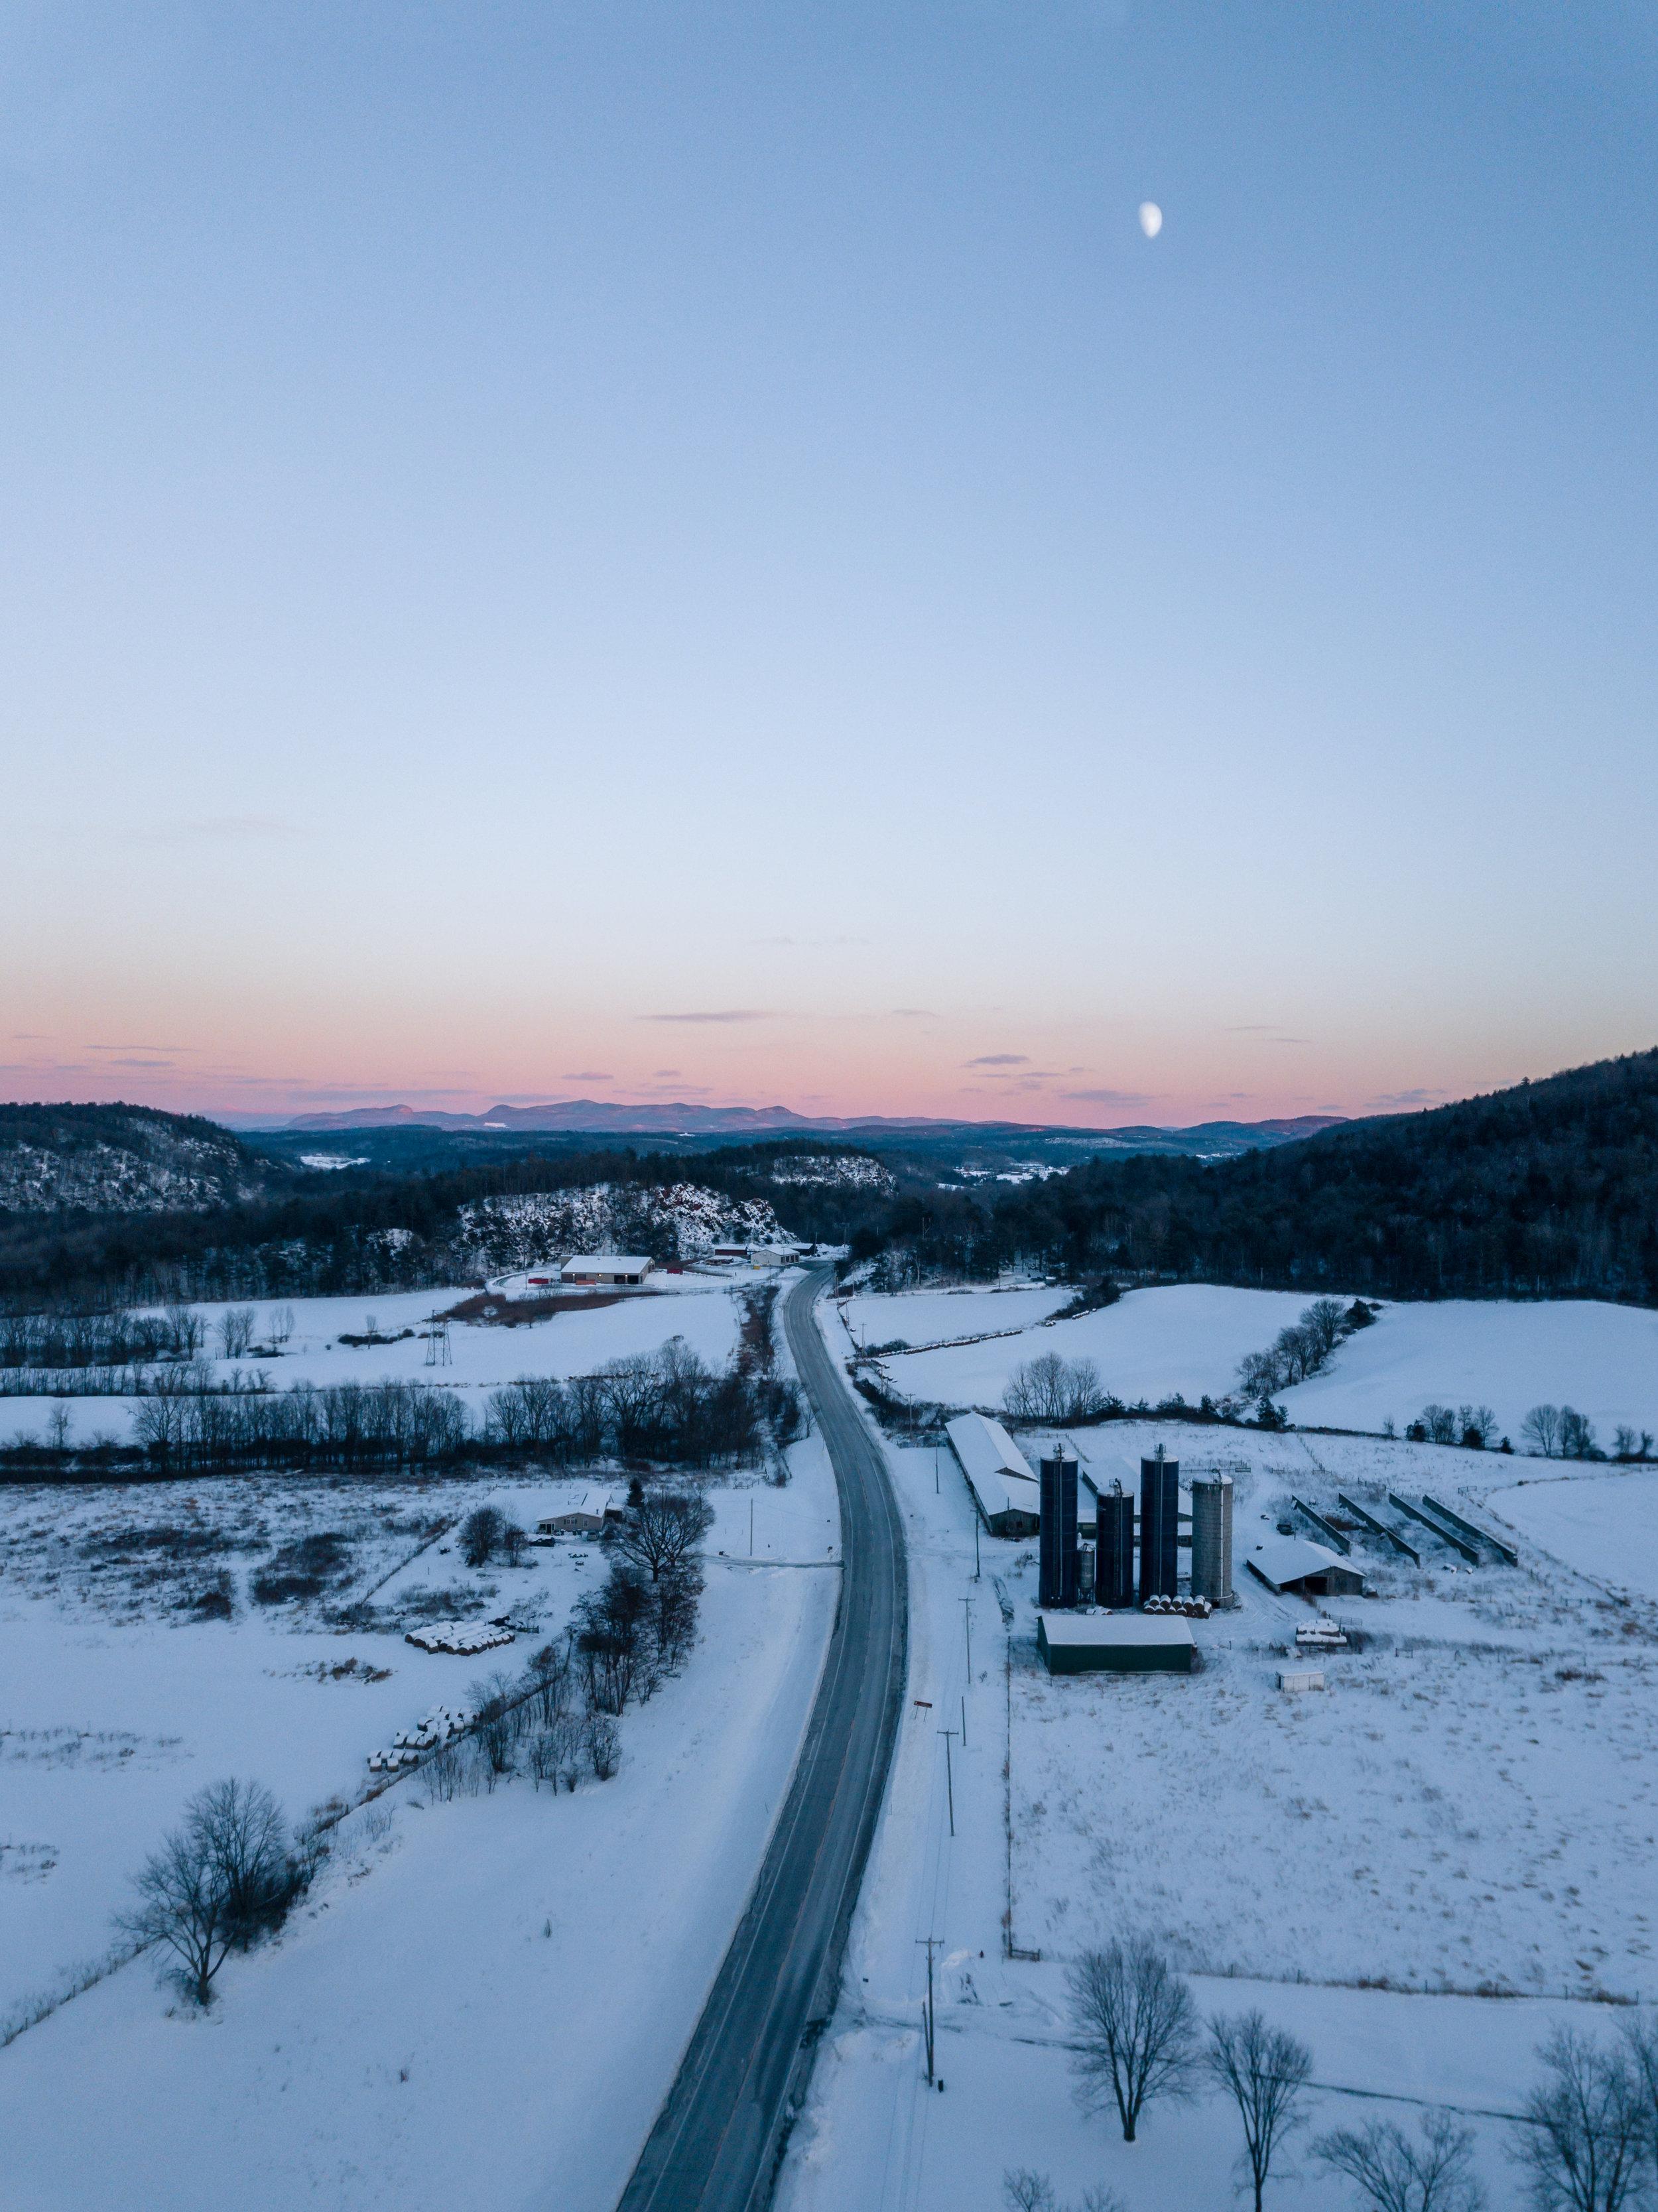 downtheroadfrozen_typoland_aerial.jpg